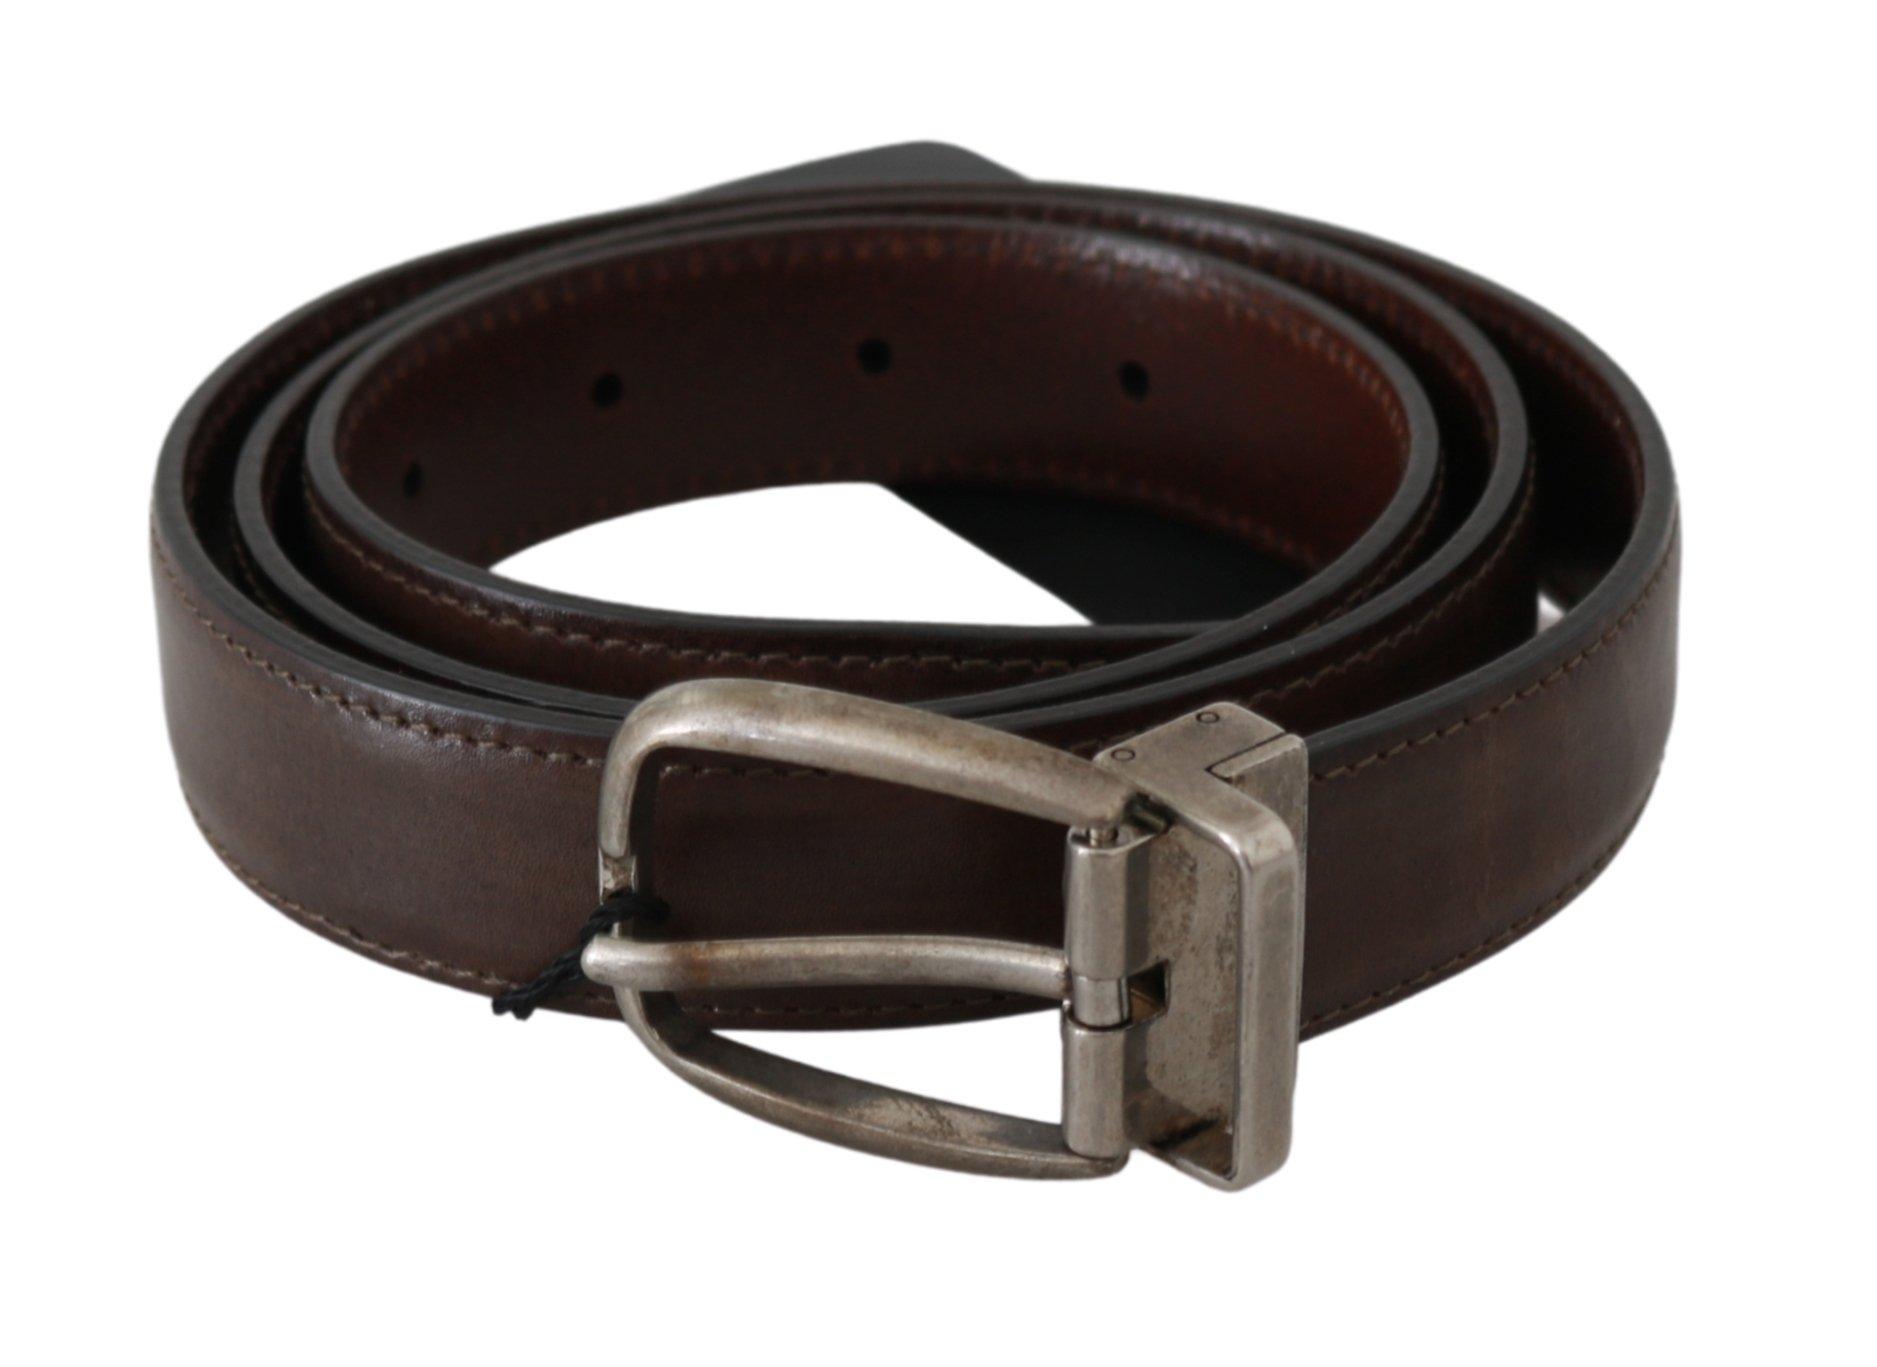 Dolce & Gabbana Men's Buckle Waist Men Leather Belt Brown BEL60544 - 95 cm / 38 Inches